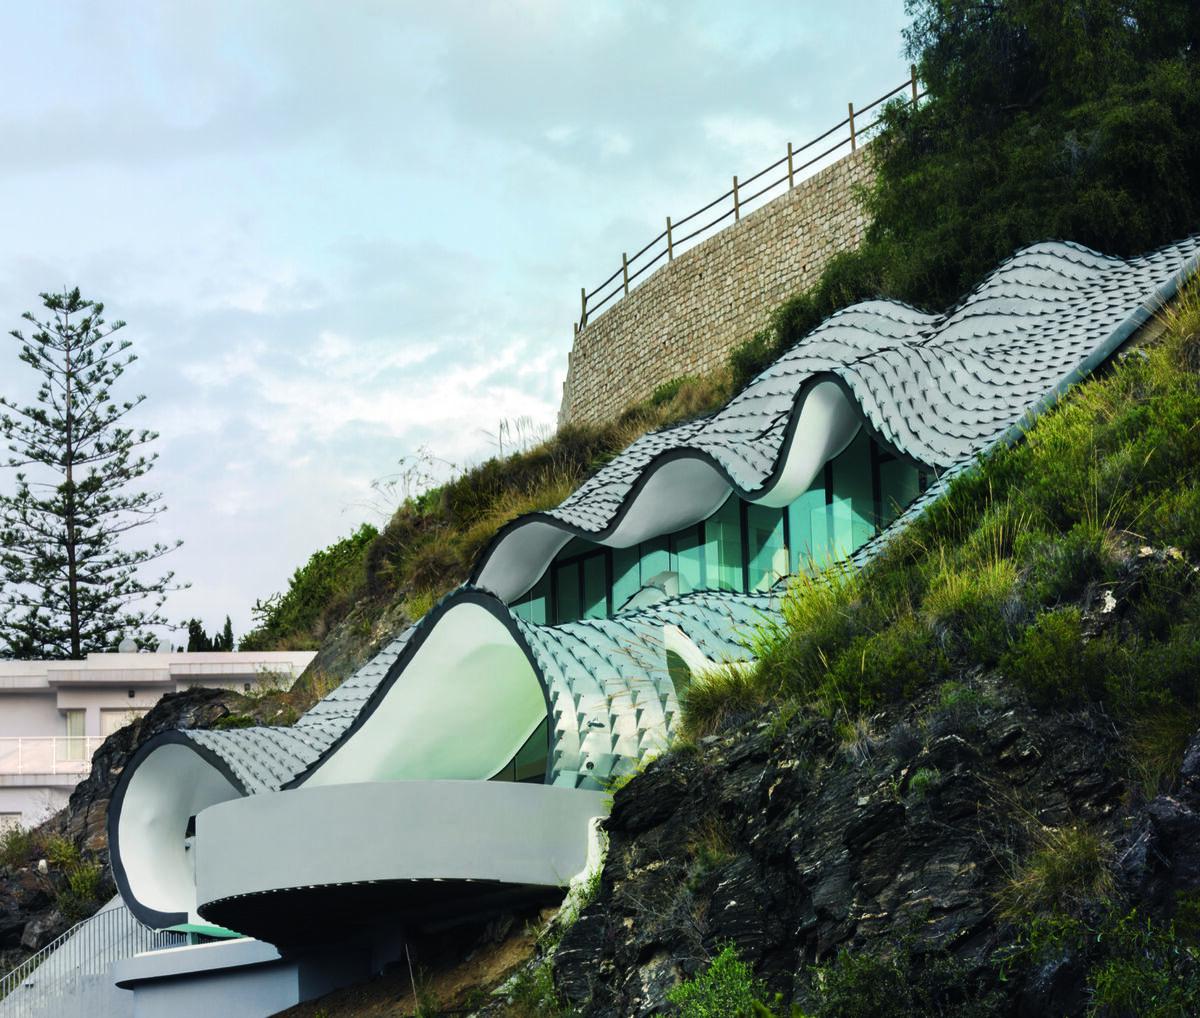 Gilbartolome Architects, The House on the Cliff, 2015, Granada, Spain. Photo by Jesus Granada. Courtesy of Phaidon.